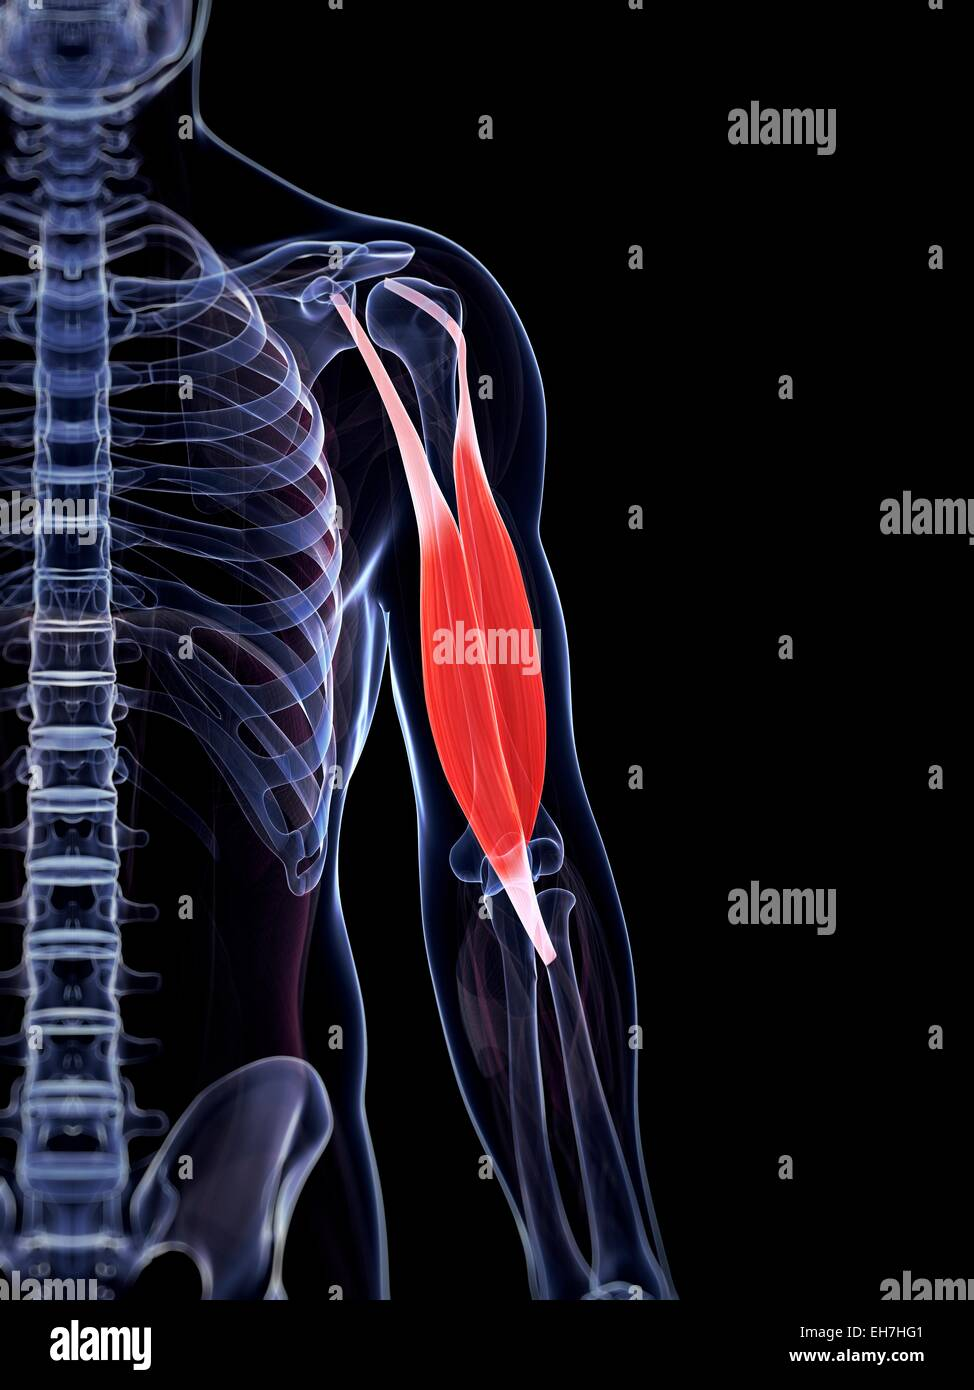 Human biceps, illustration - Stock Image